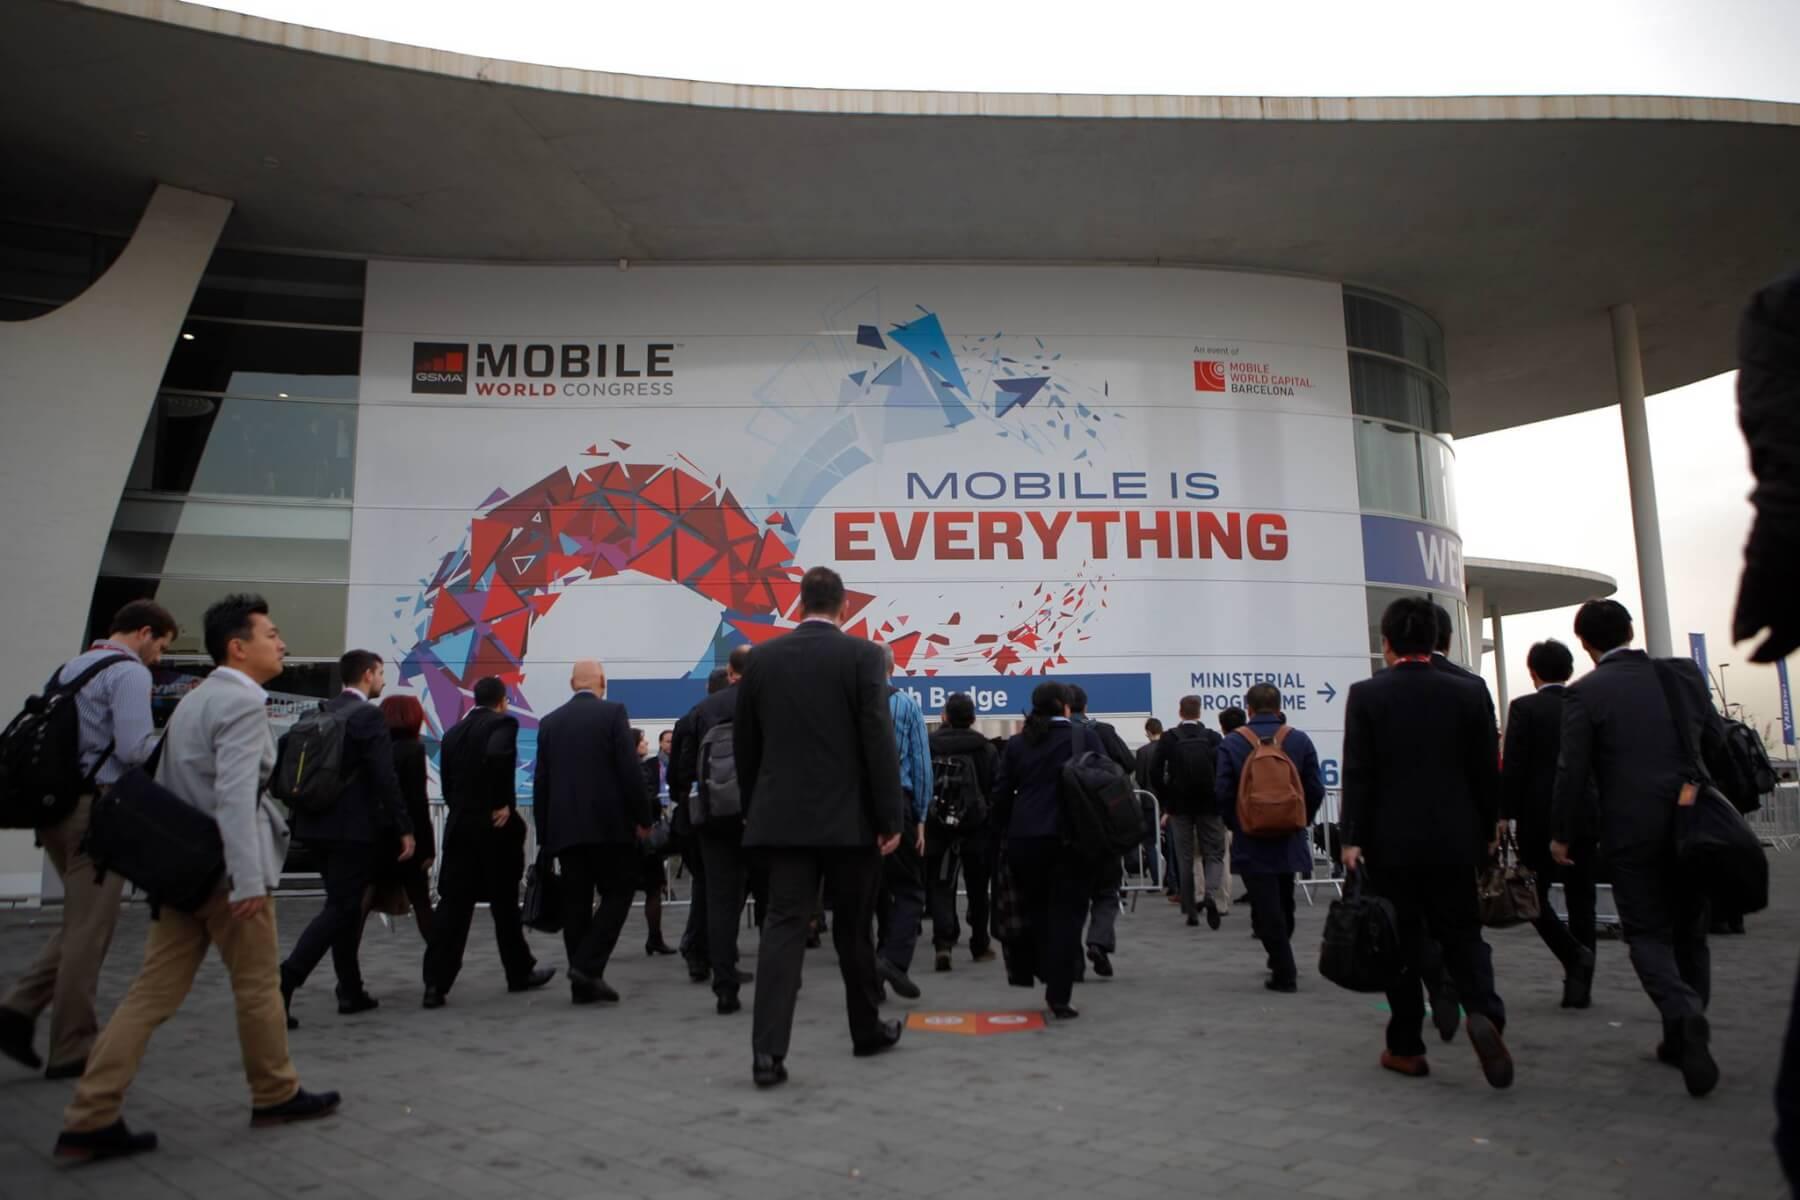 mobile world congress visitors